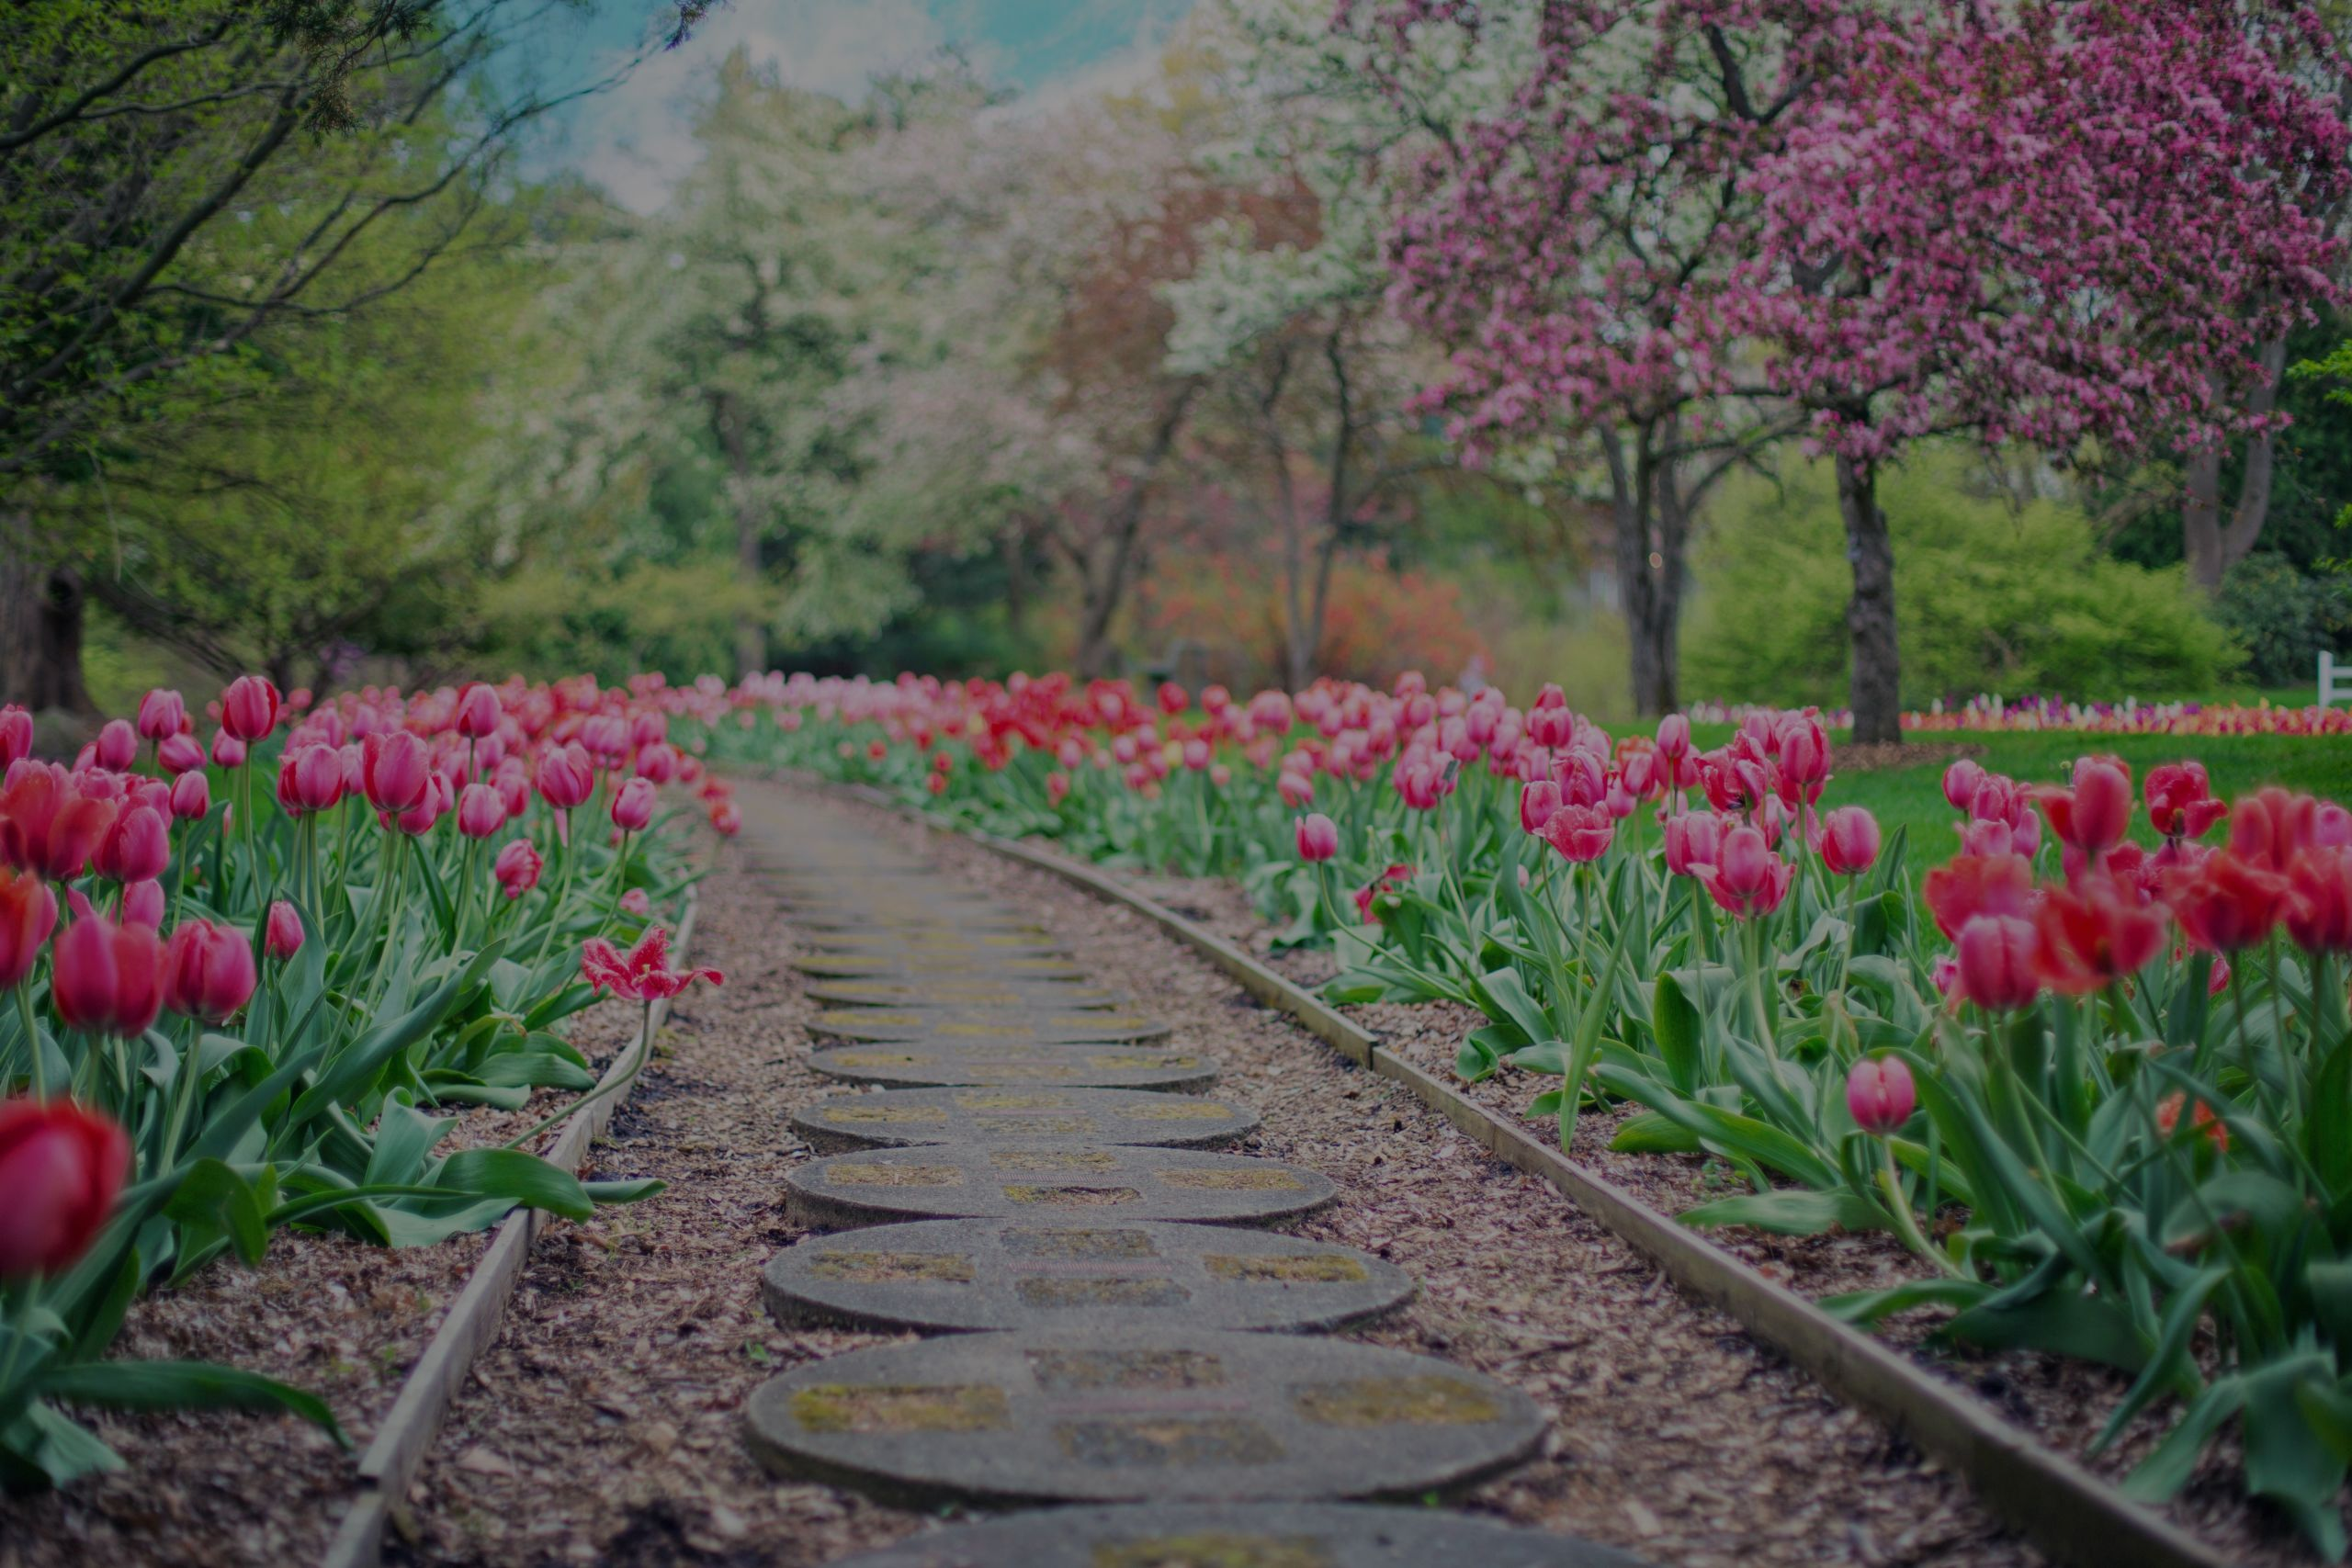 Landscaping Return on Investment- Source: National Association of Realtors (2018)